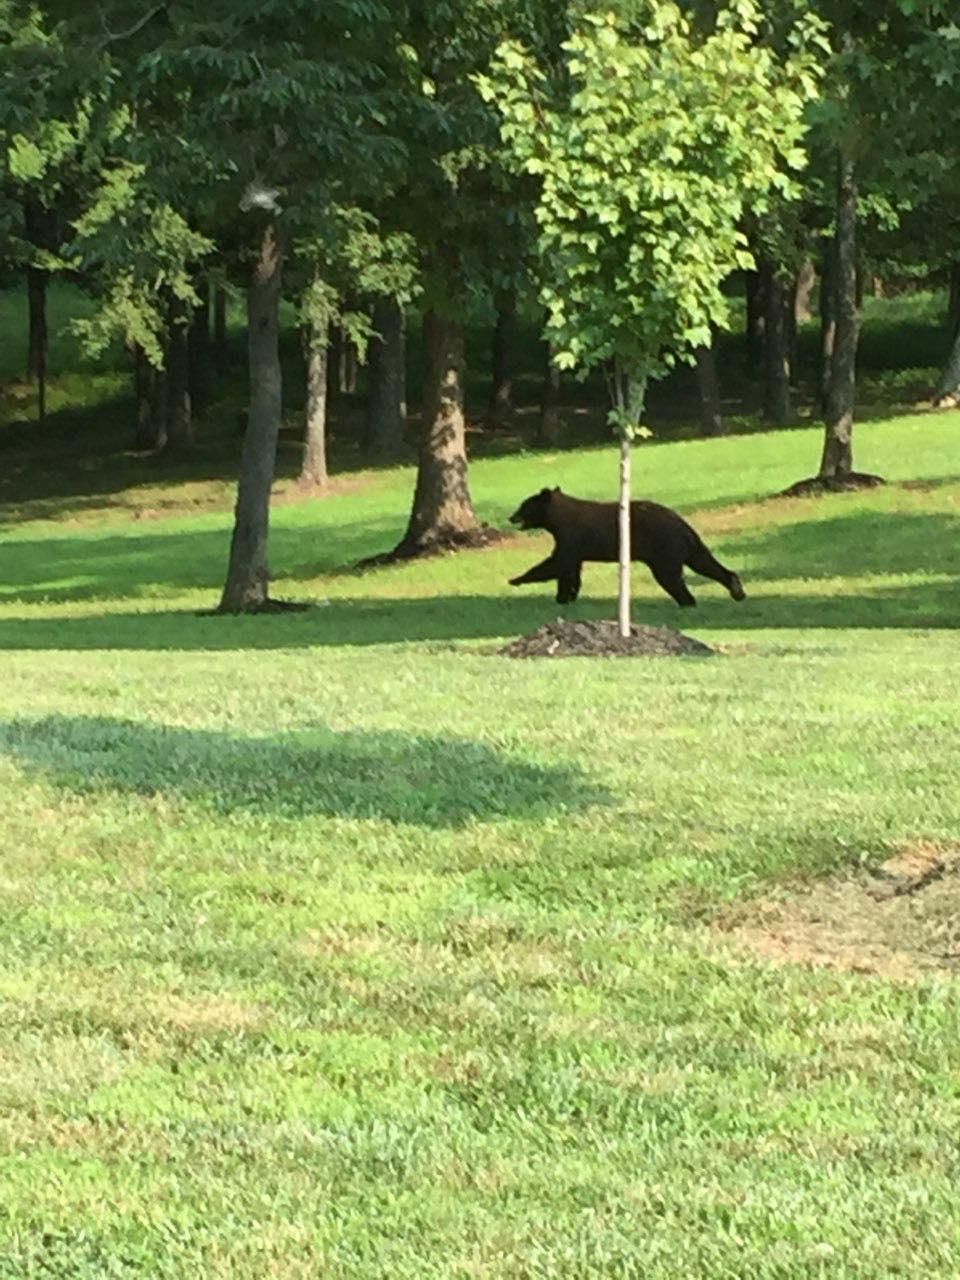 Bear sighting in Dixon, KY